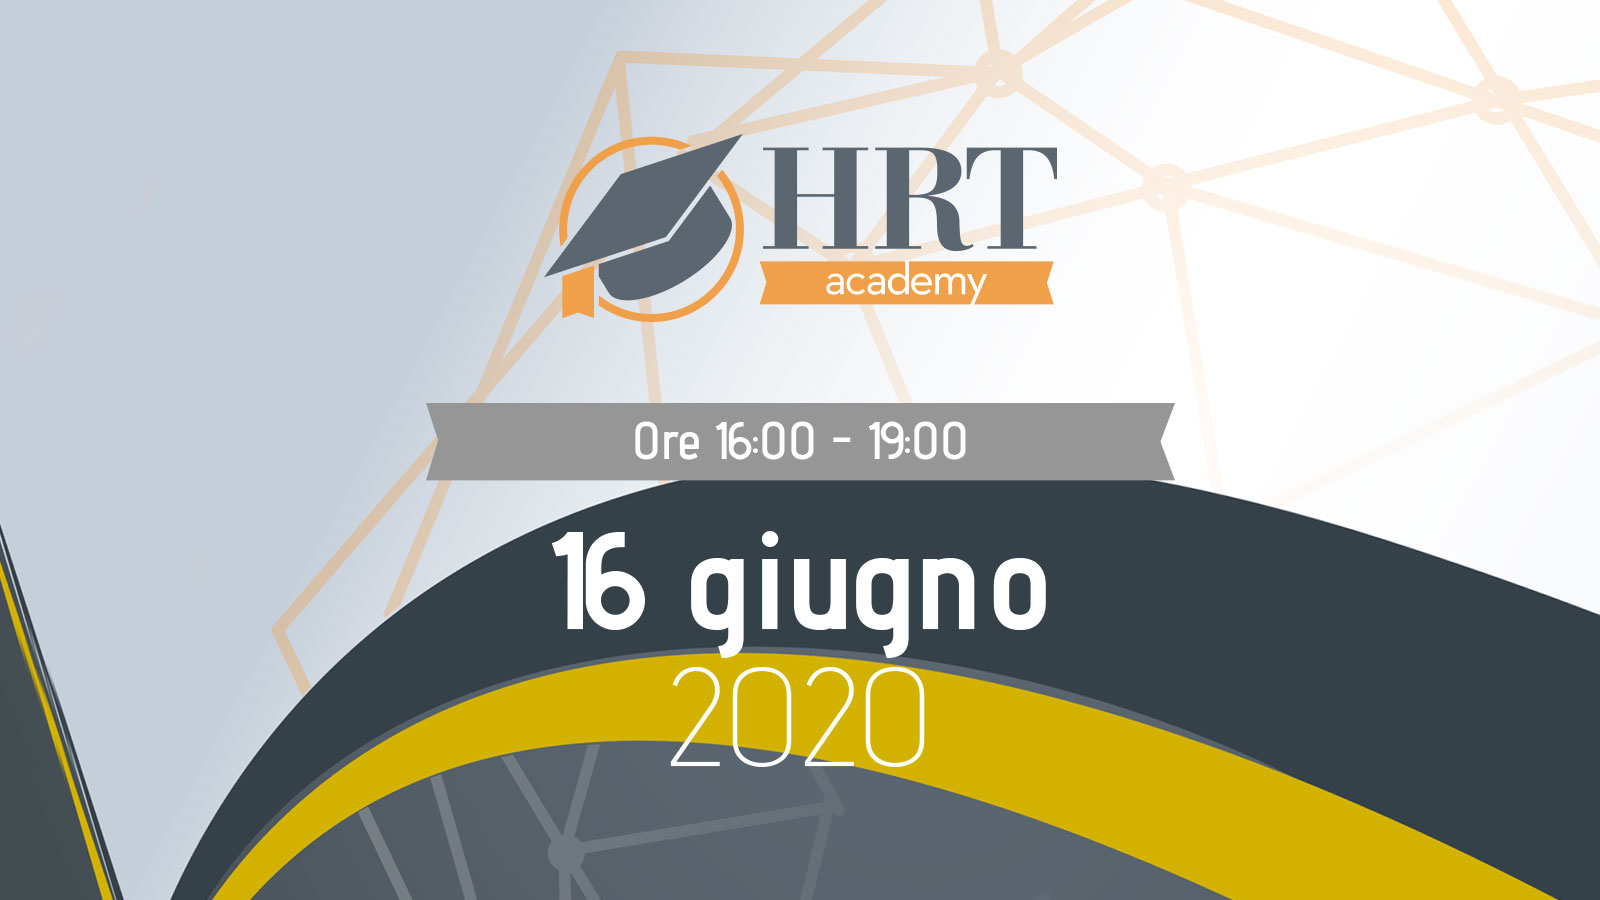 HRT academy